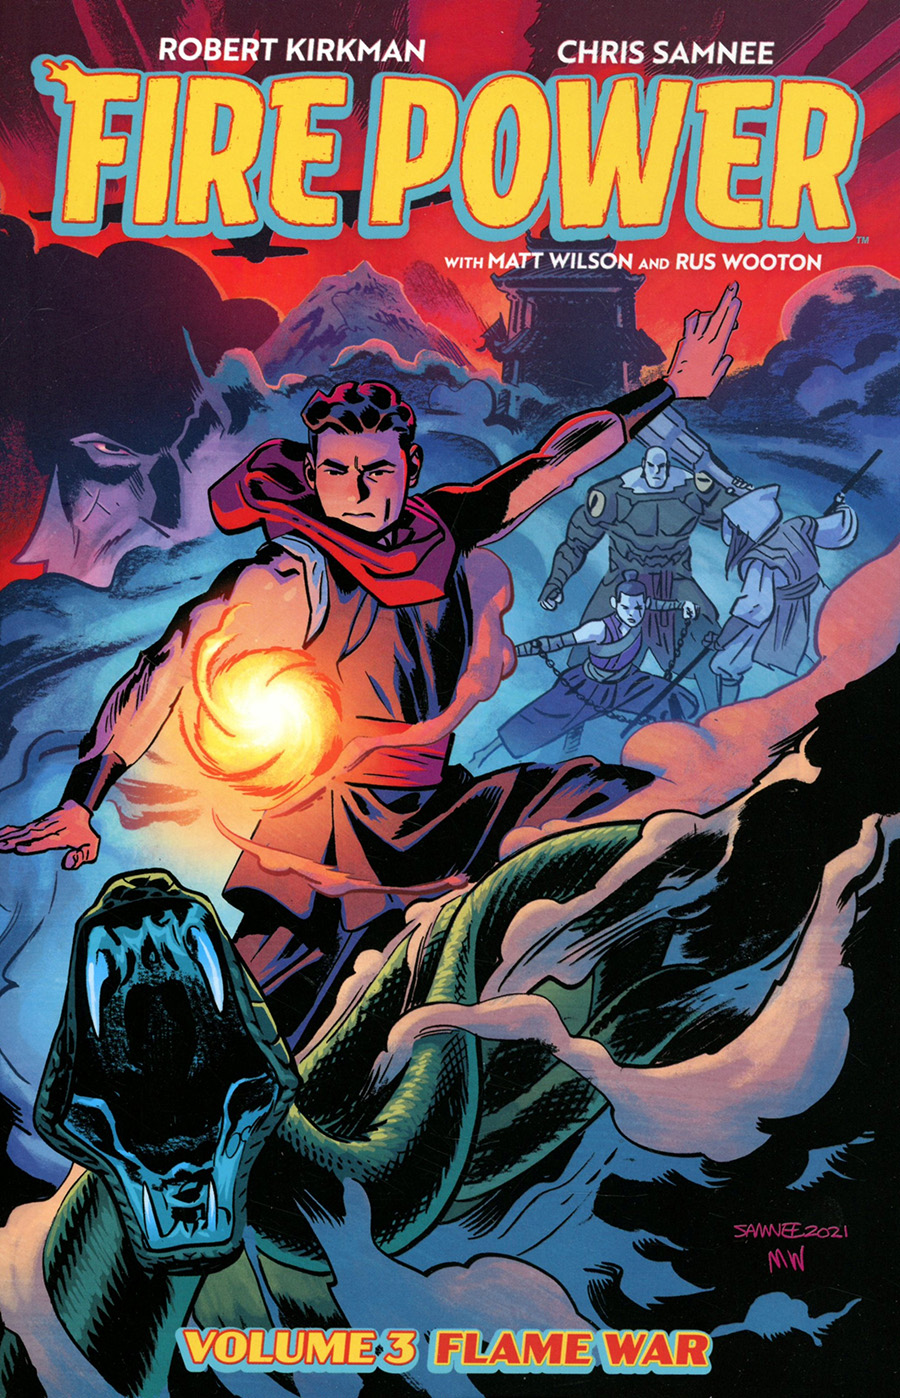 Fire Power By Kirkman & Samnee Vol 3 Flame War TP